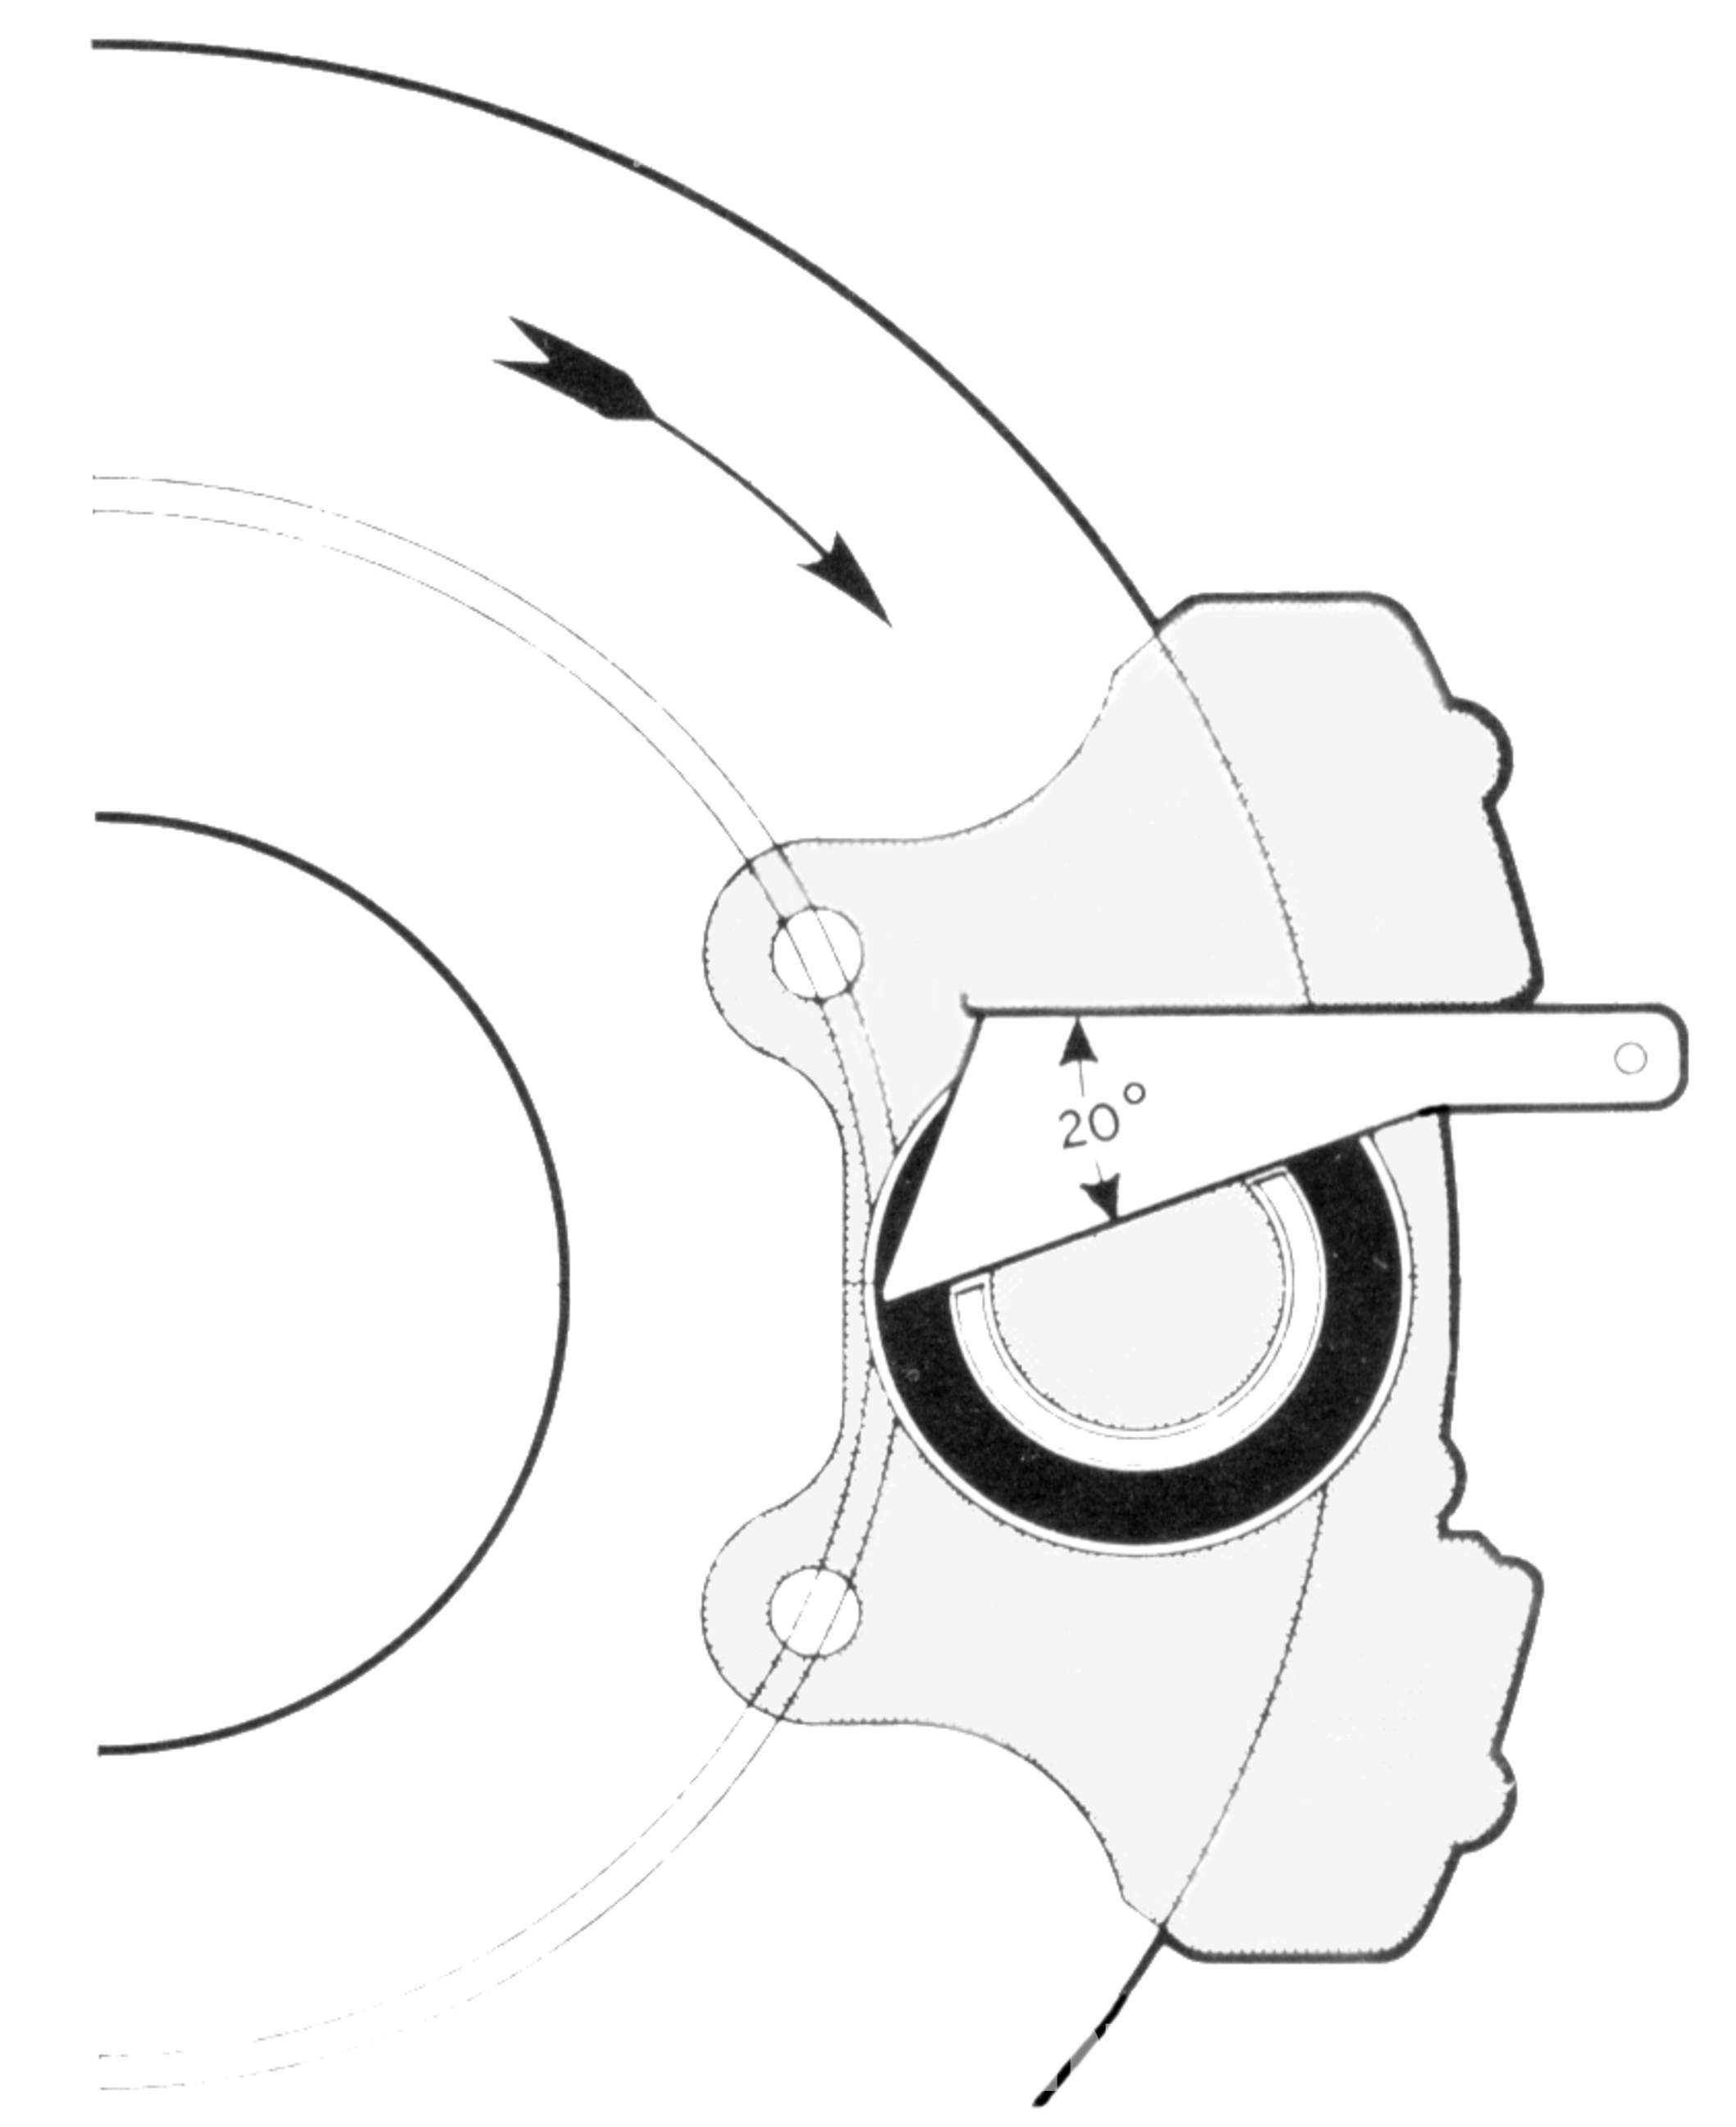 how to make large caliper